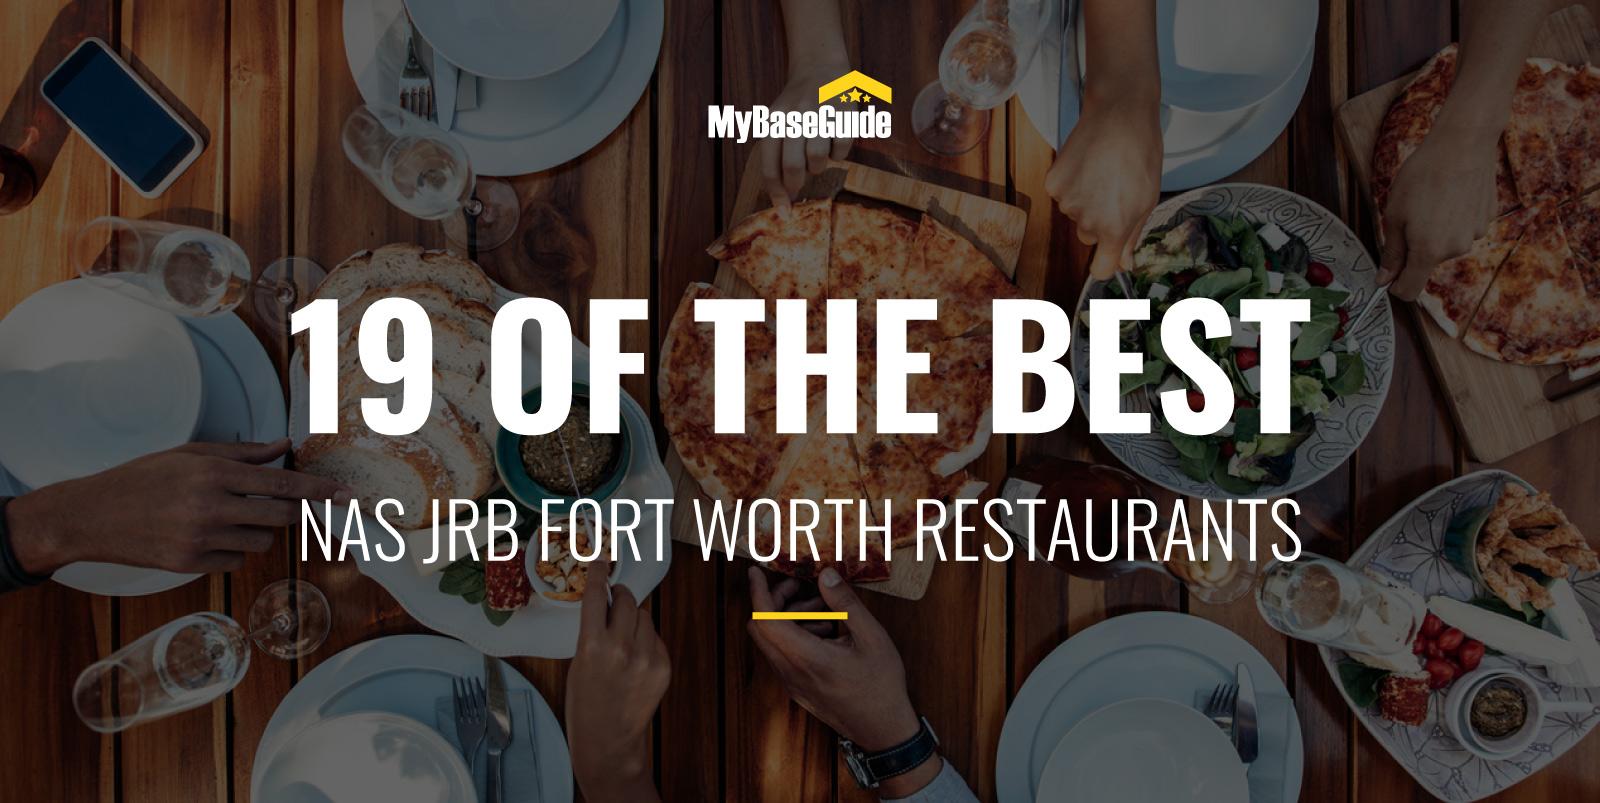 19 of the Best NAS JRB Fort Worth Restaurants